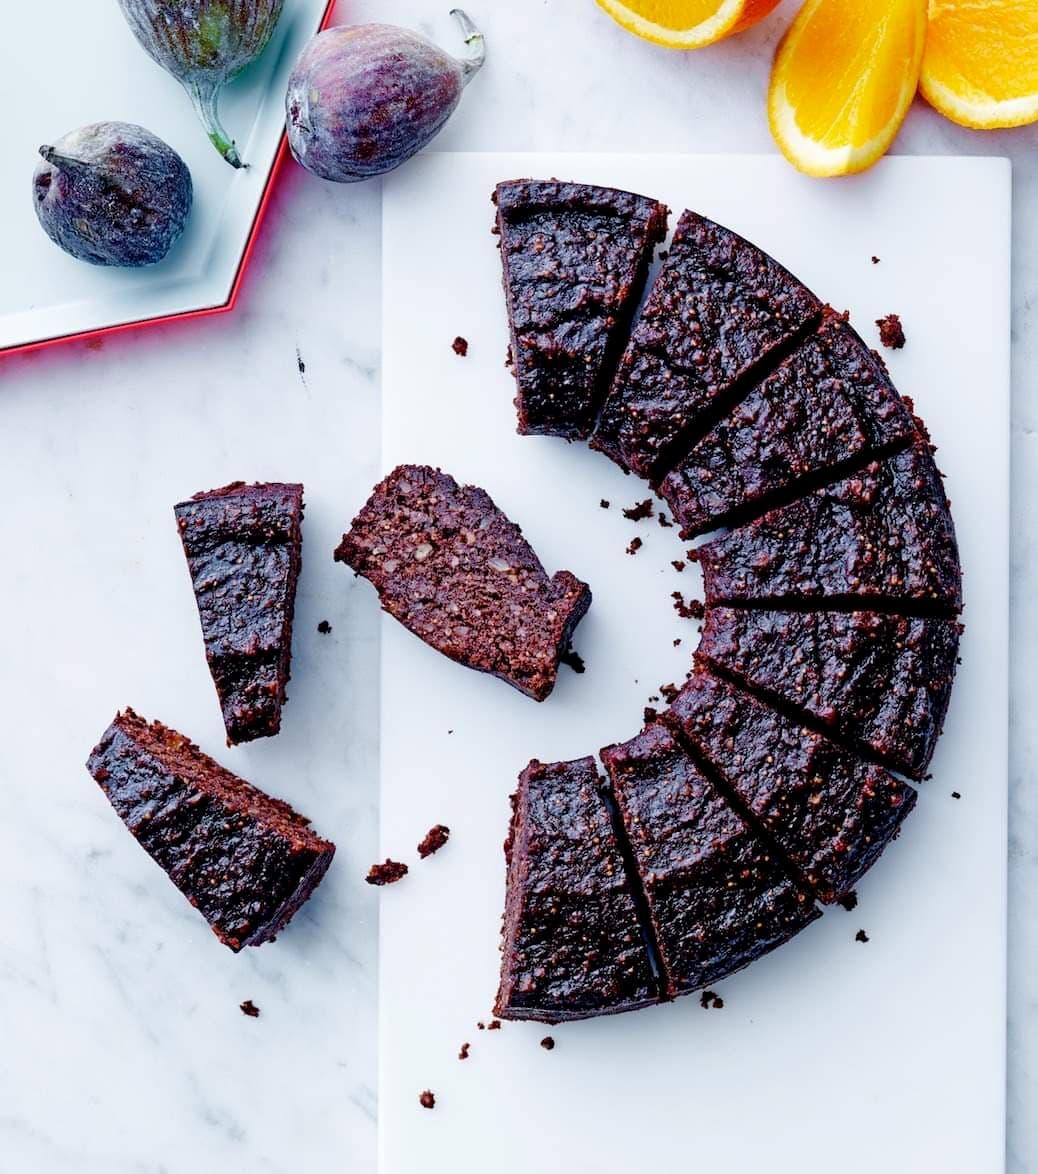 Chokocrunch-kage